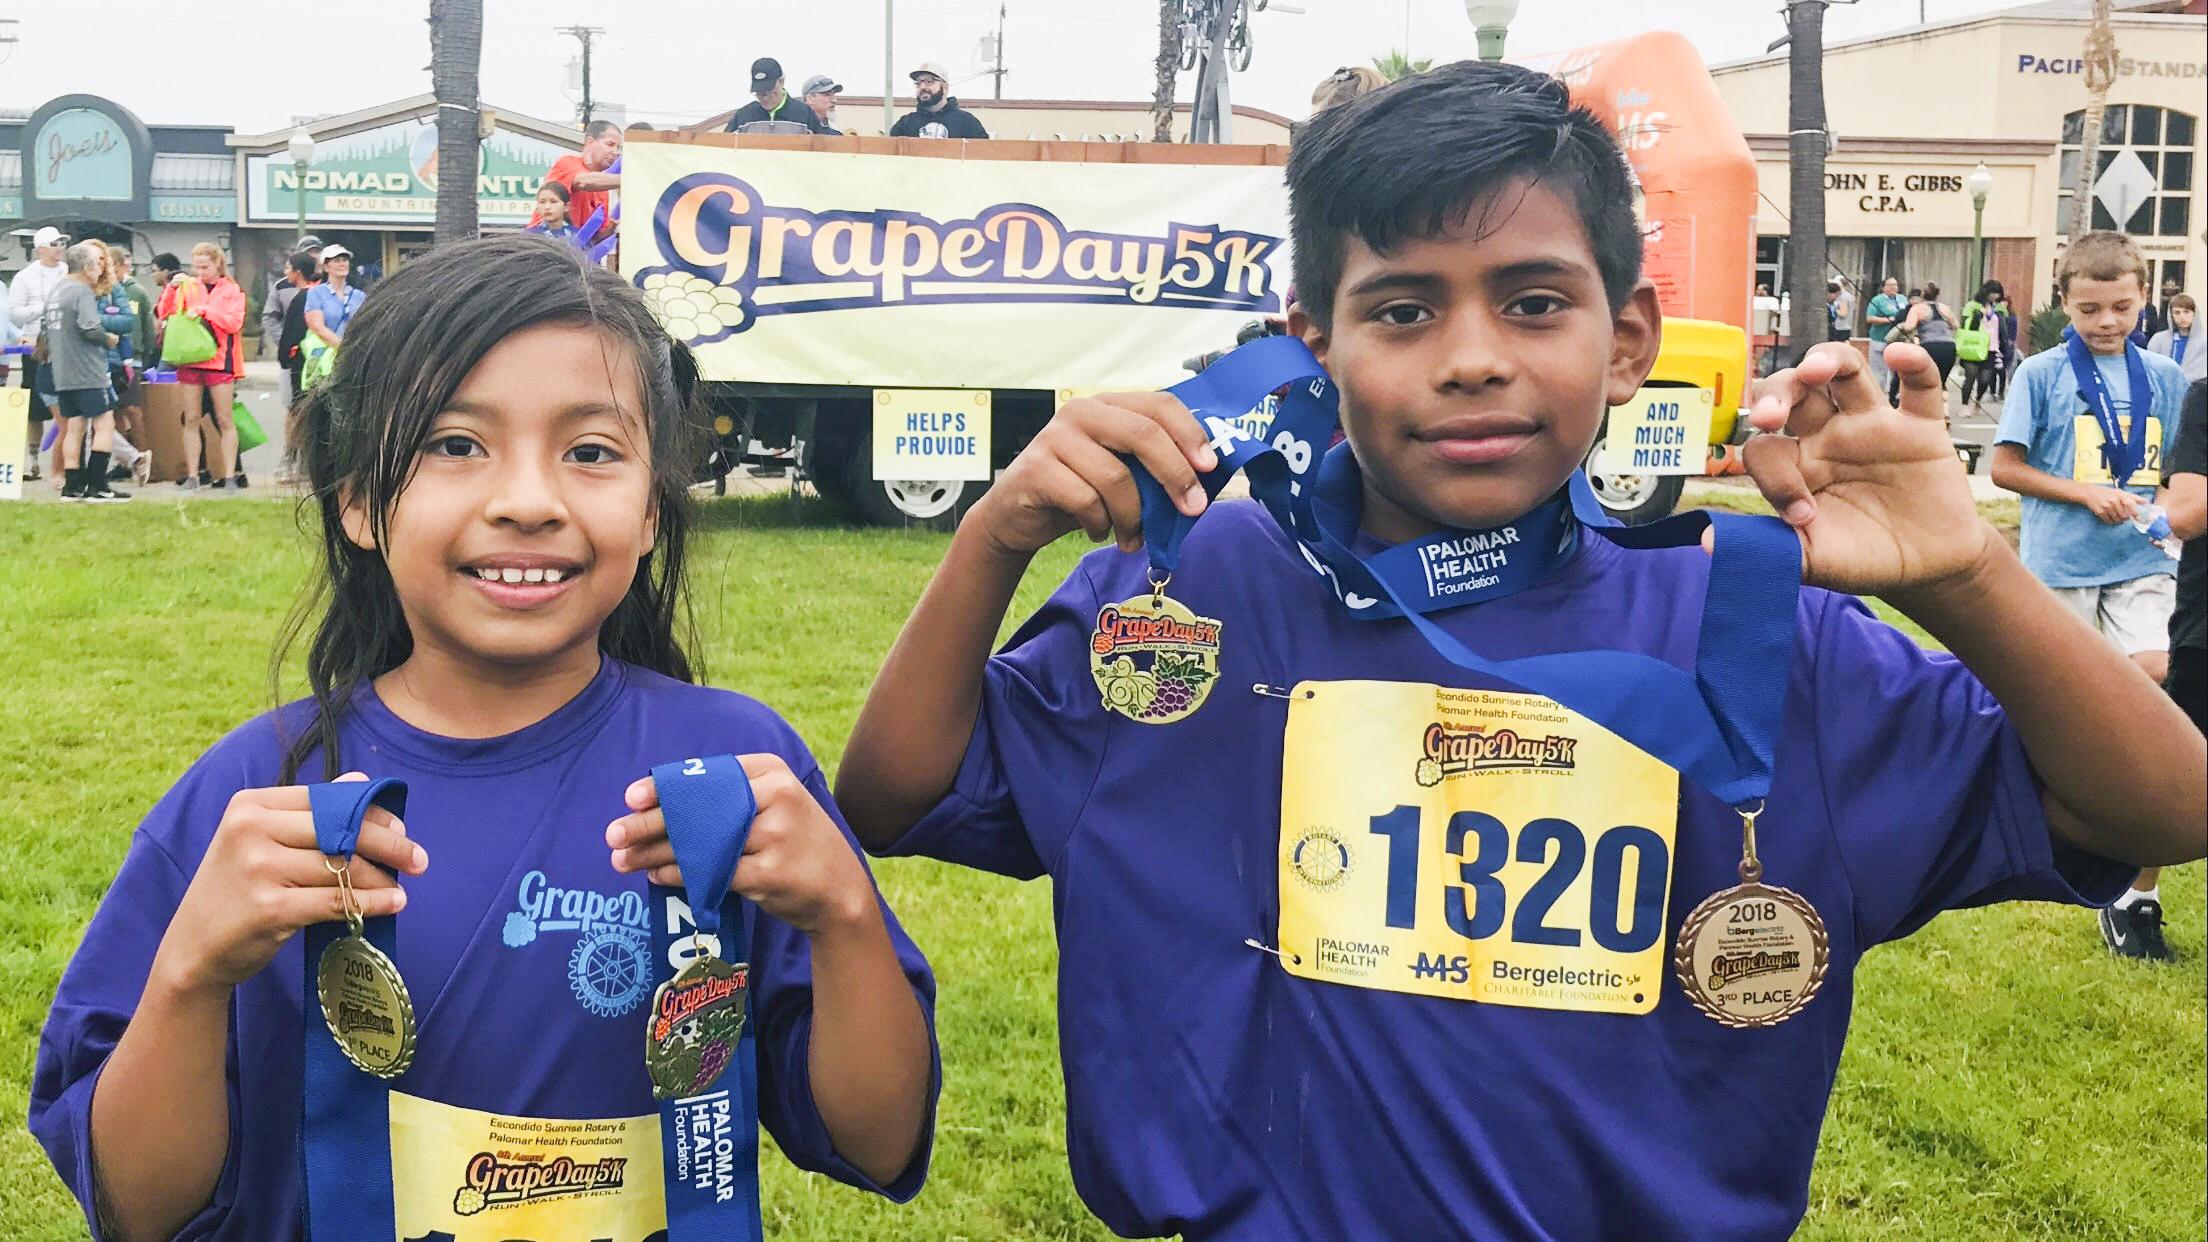 Grape Day Festival lives on through 5K, revitalization plans in works